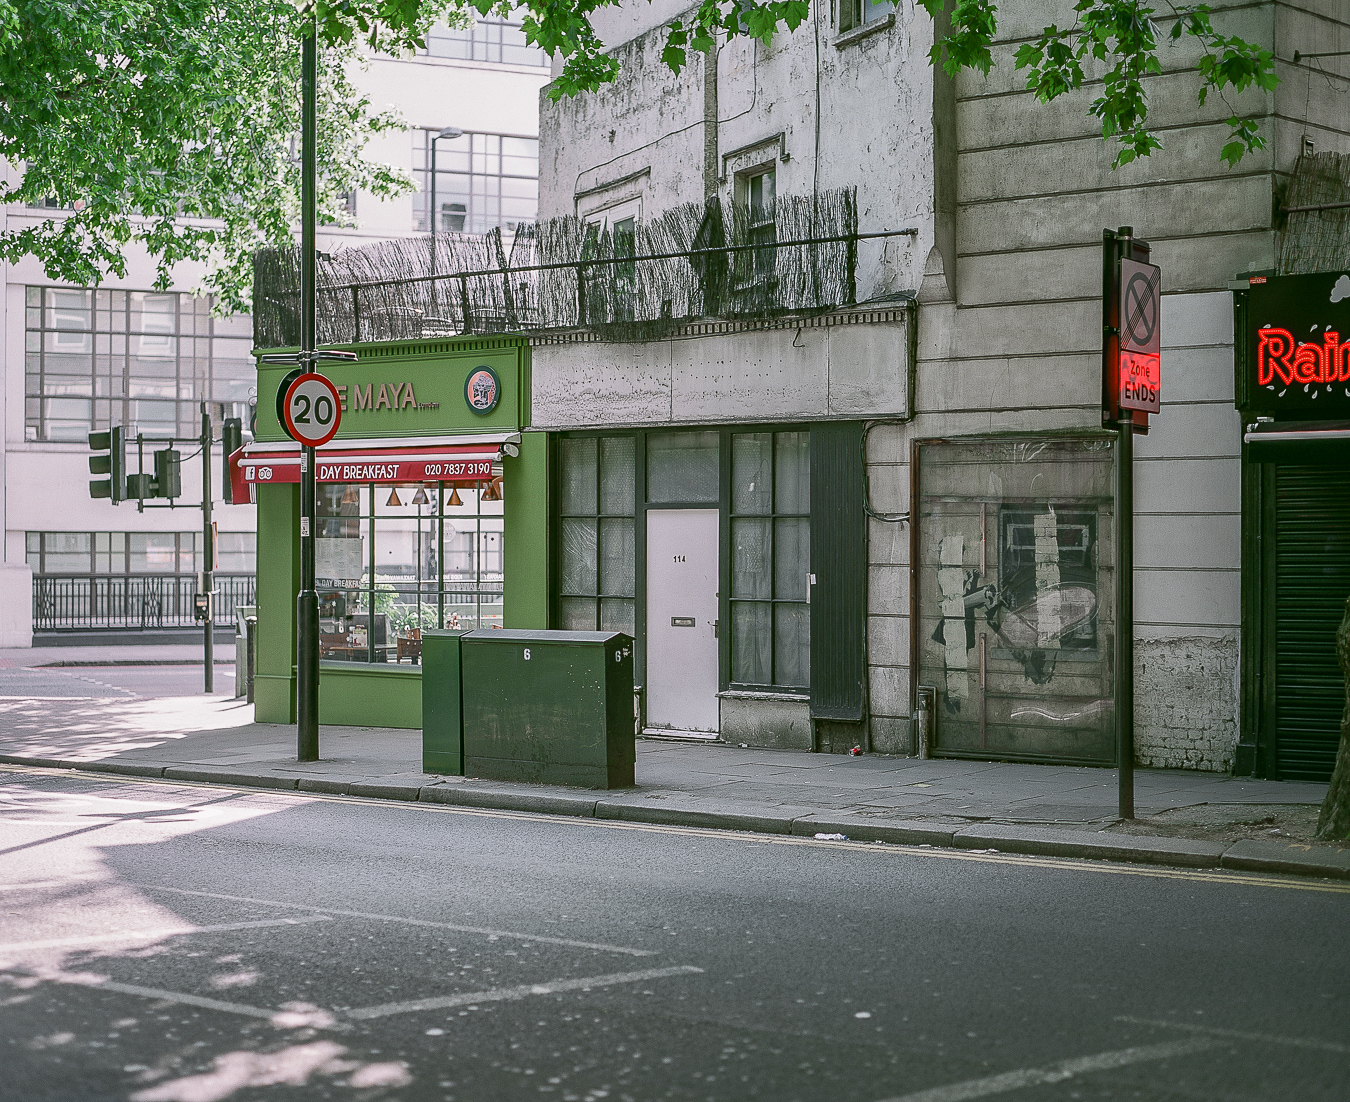 Banksy's 'Cash Machine',Rosebery Avenue, London - ARTVISIT